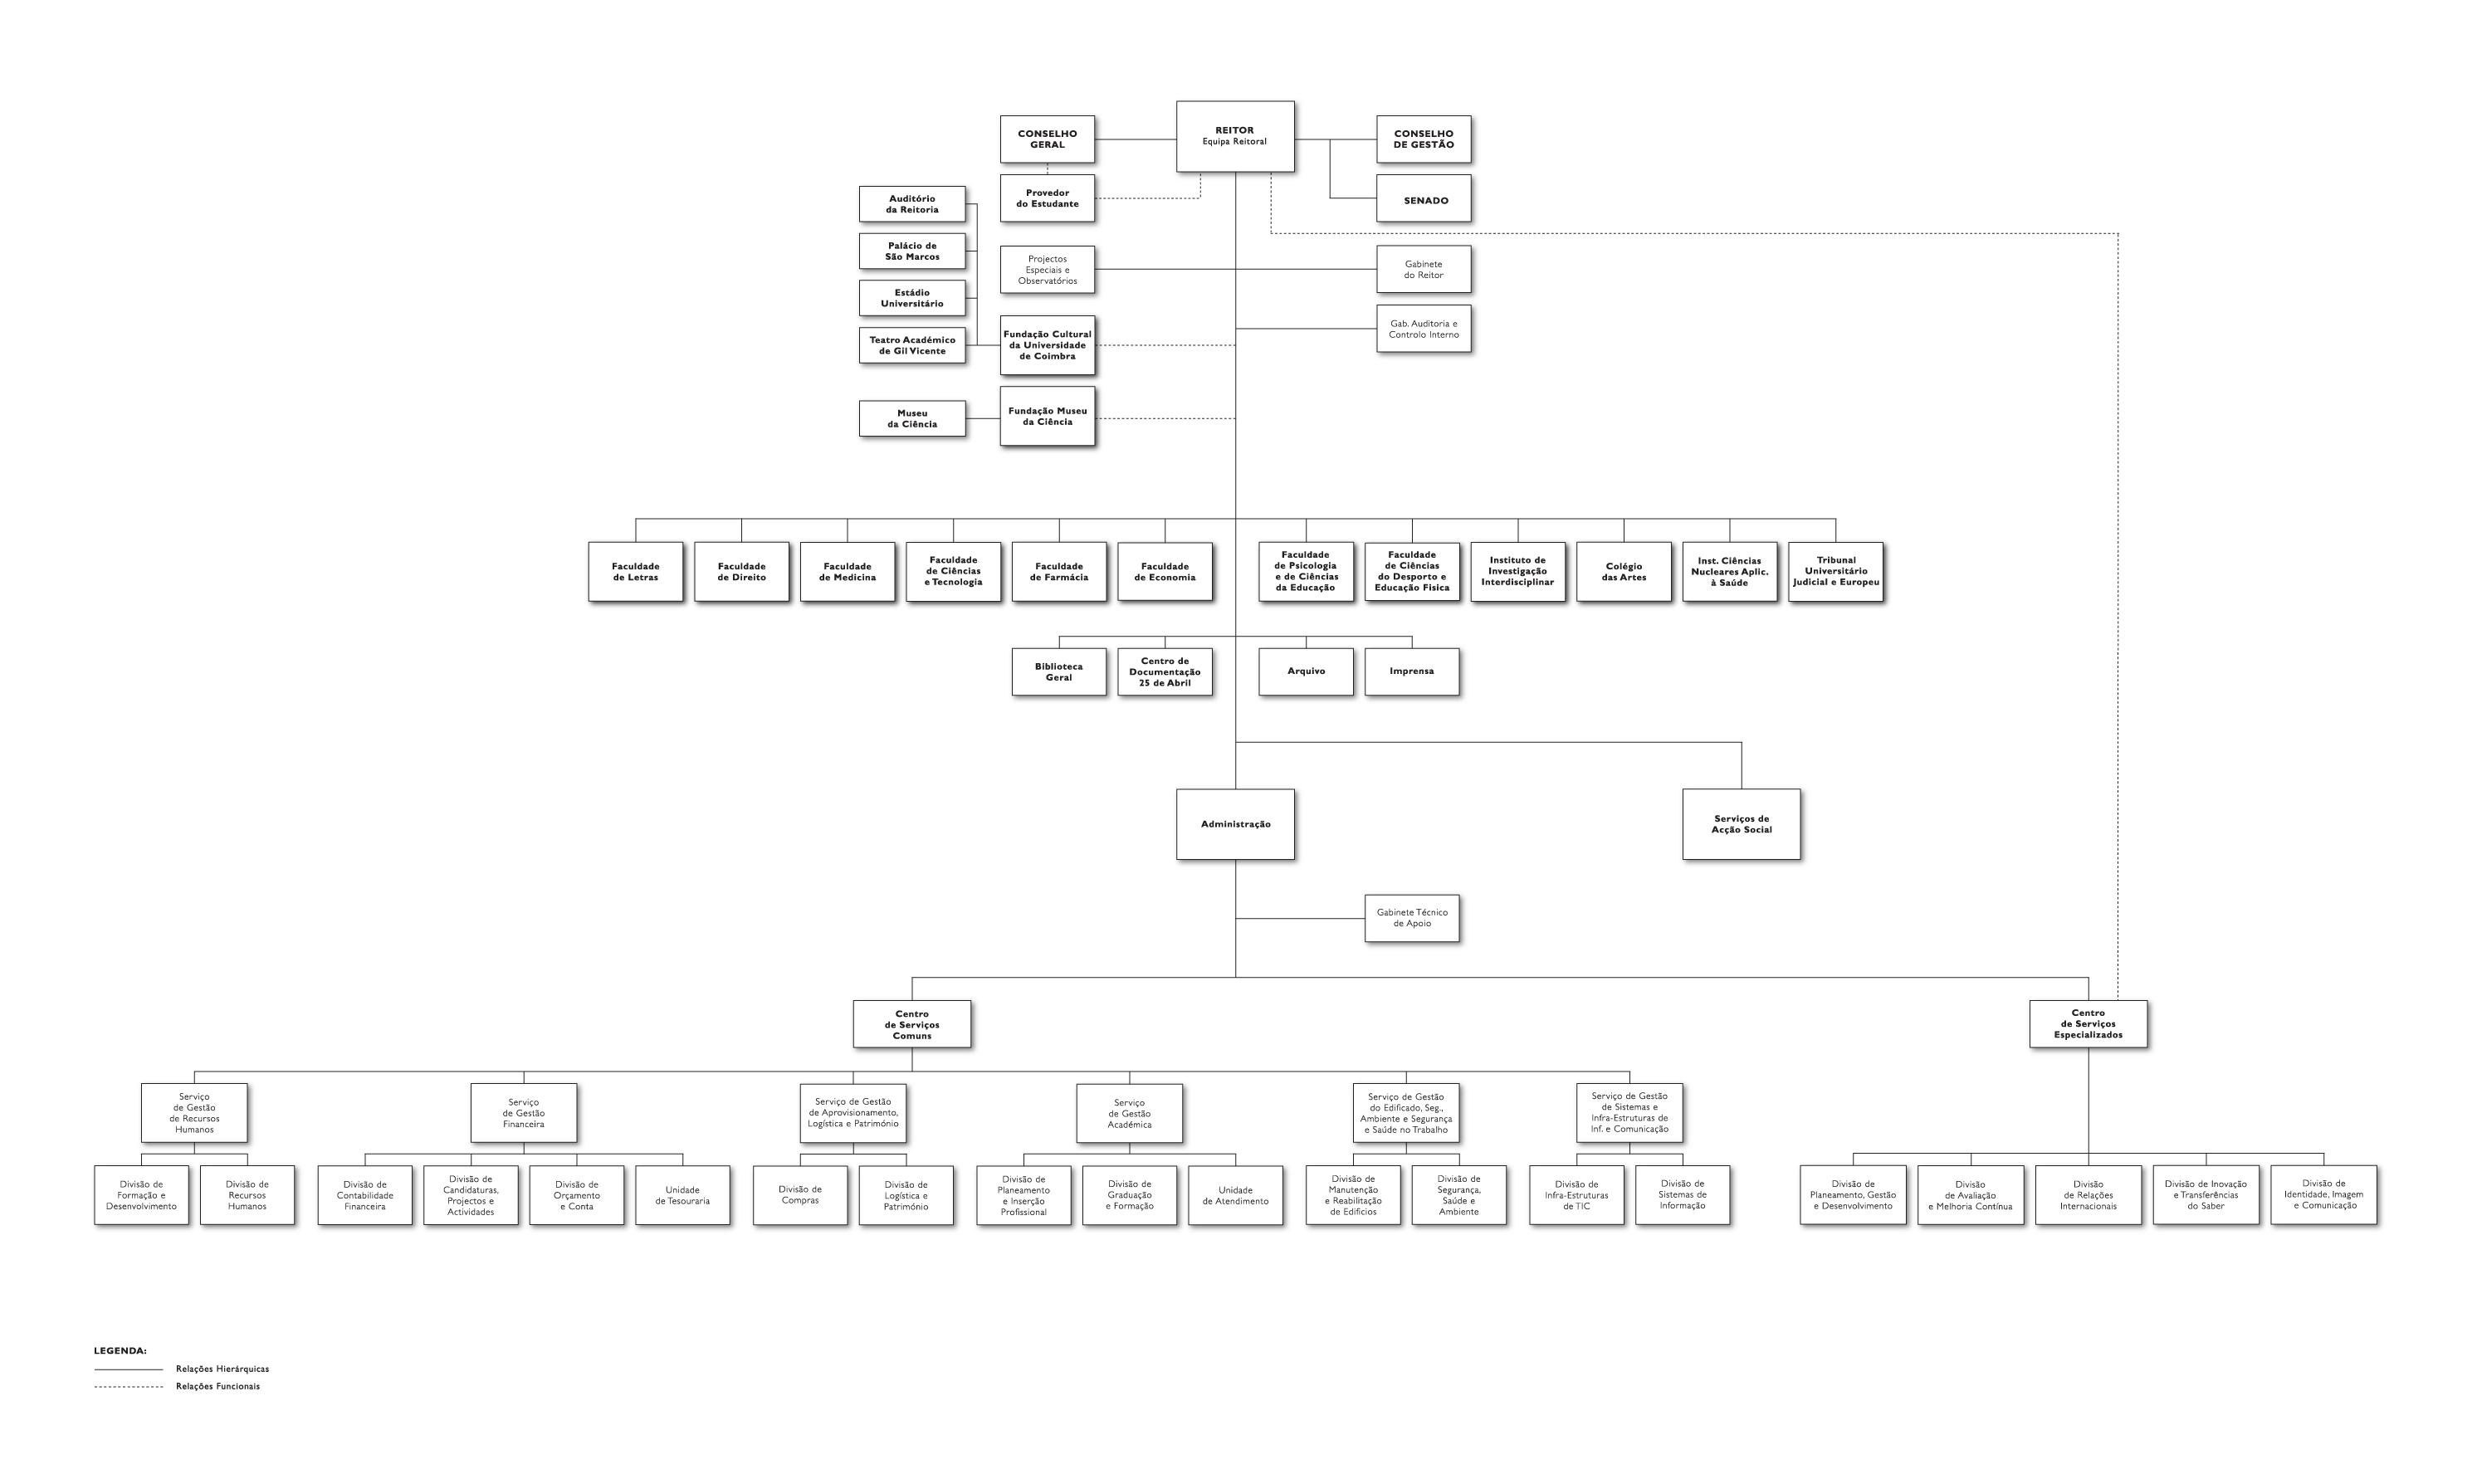 Supporting The Entrepreneurial Potential Of Higher Education Work Likewise Cafe Floor Plan Design On Ups Circuit Diagram Pdf See For Universitys Organization Http Ucpt En Sobrenos Organogramahires